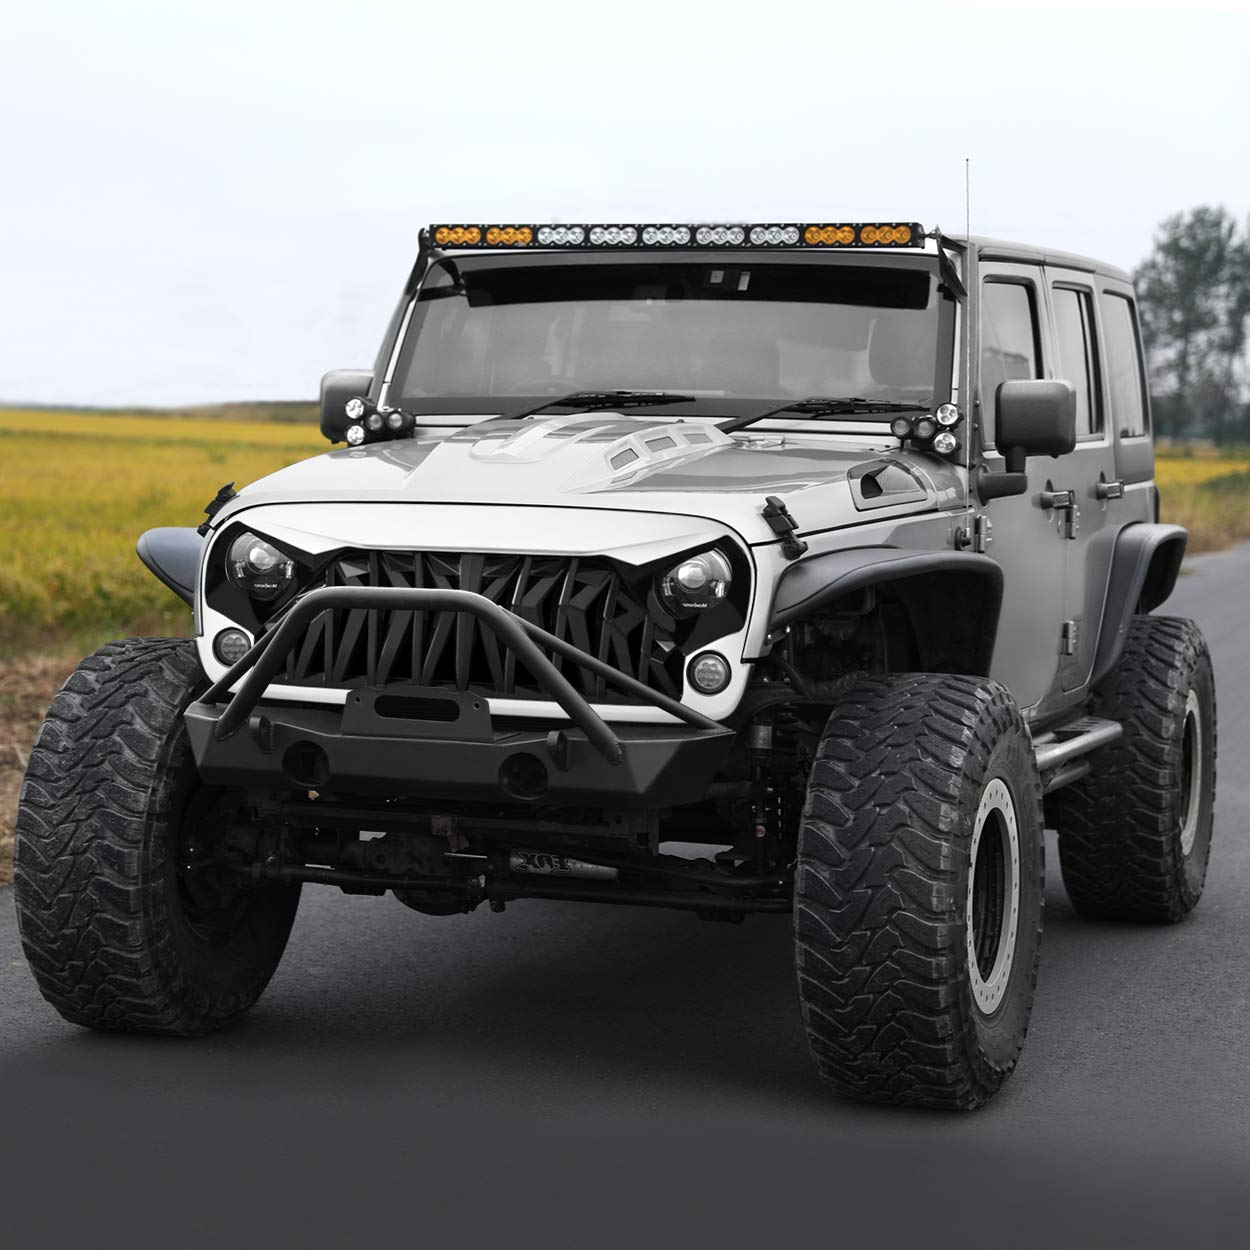 Allinoneparts White /& Black Front Shark Grille for Jeep Wrangler Rubicon Sahara Sport JK JKU 2007-2018 ABS